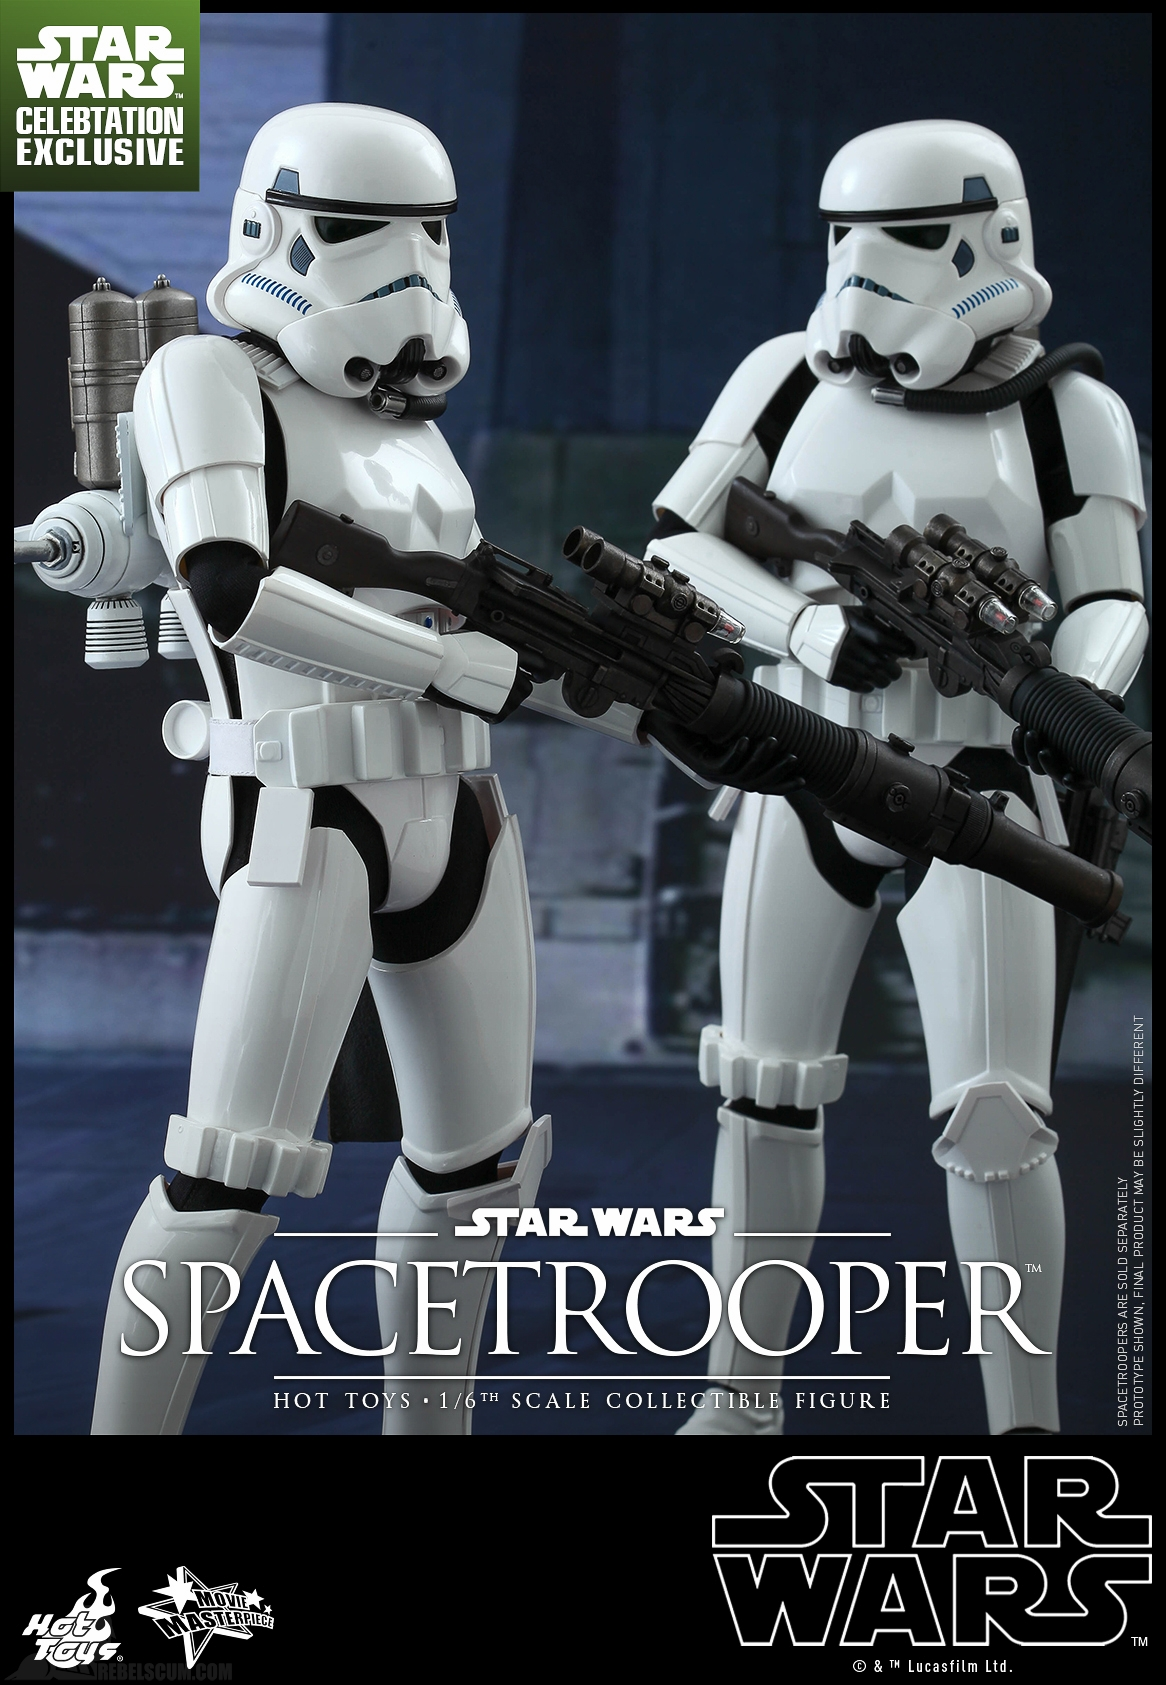 Th Star Wars Movie Name